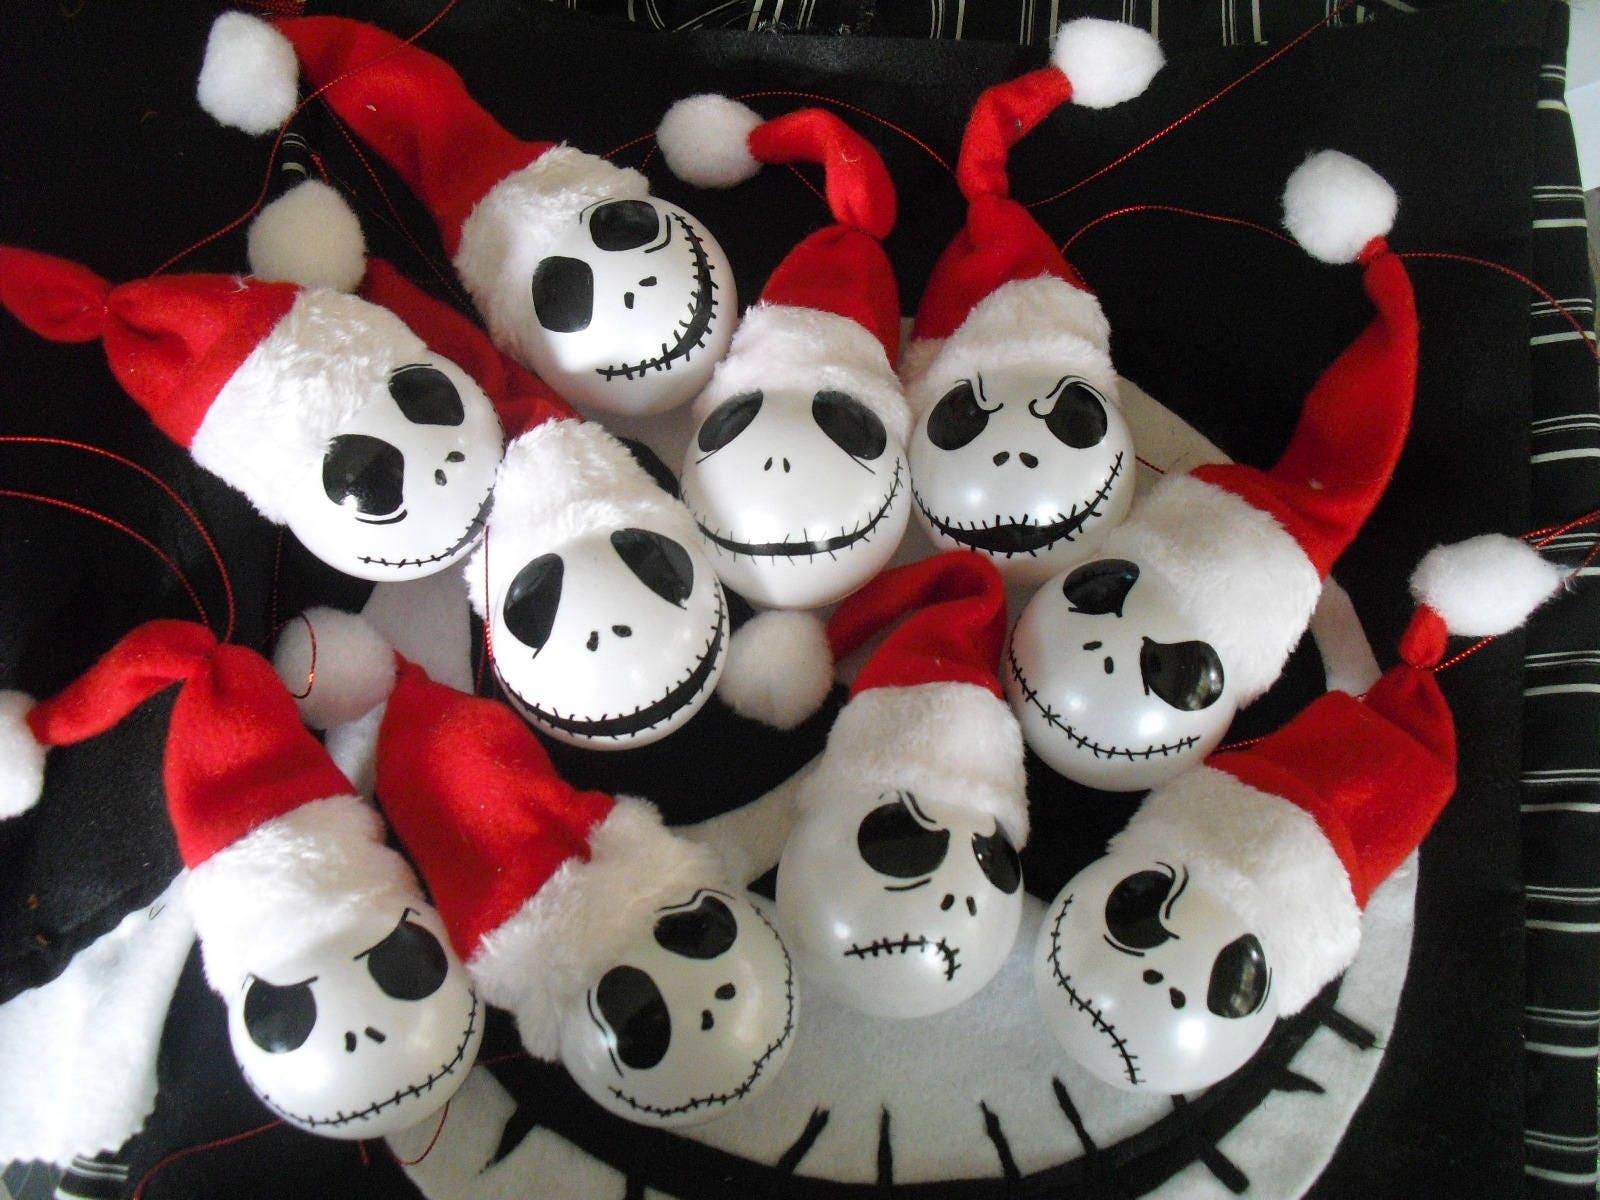 Santa Jack Christbaumkugeln Nightmare Before Christmas | Etsy